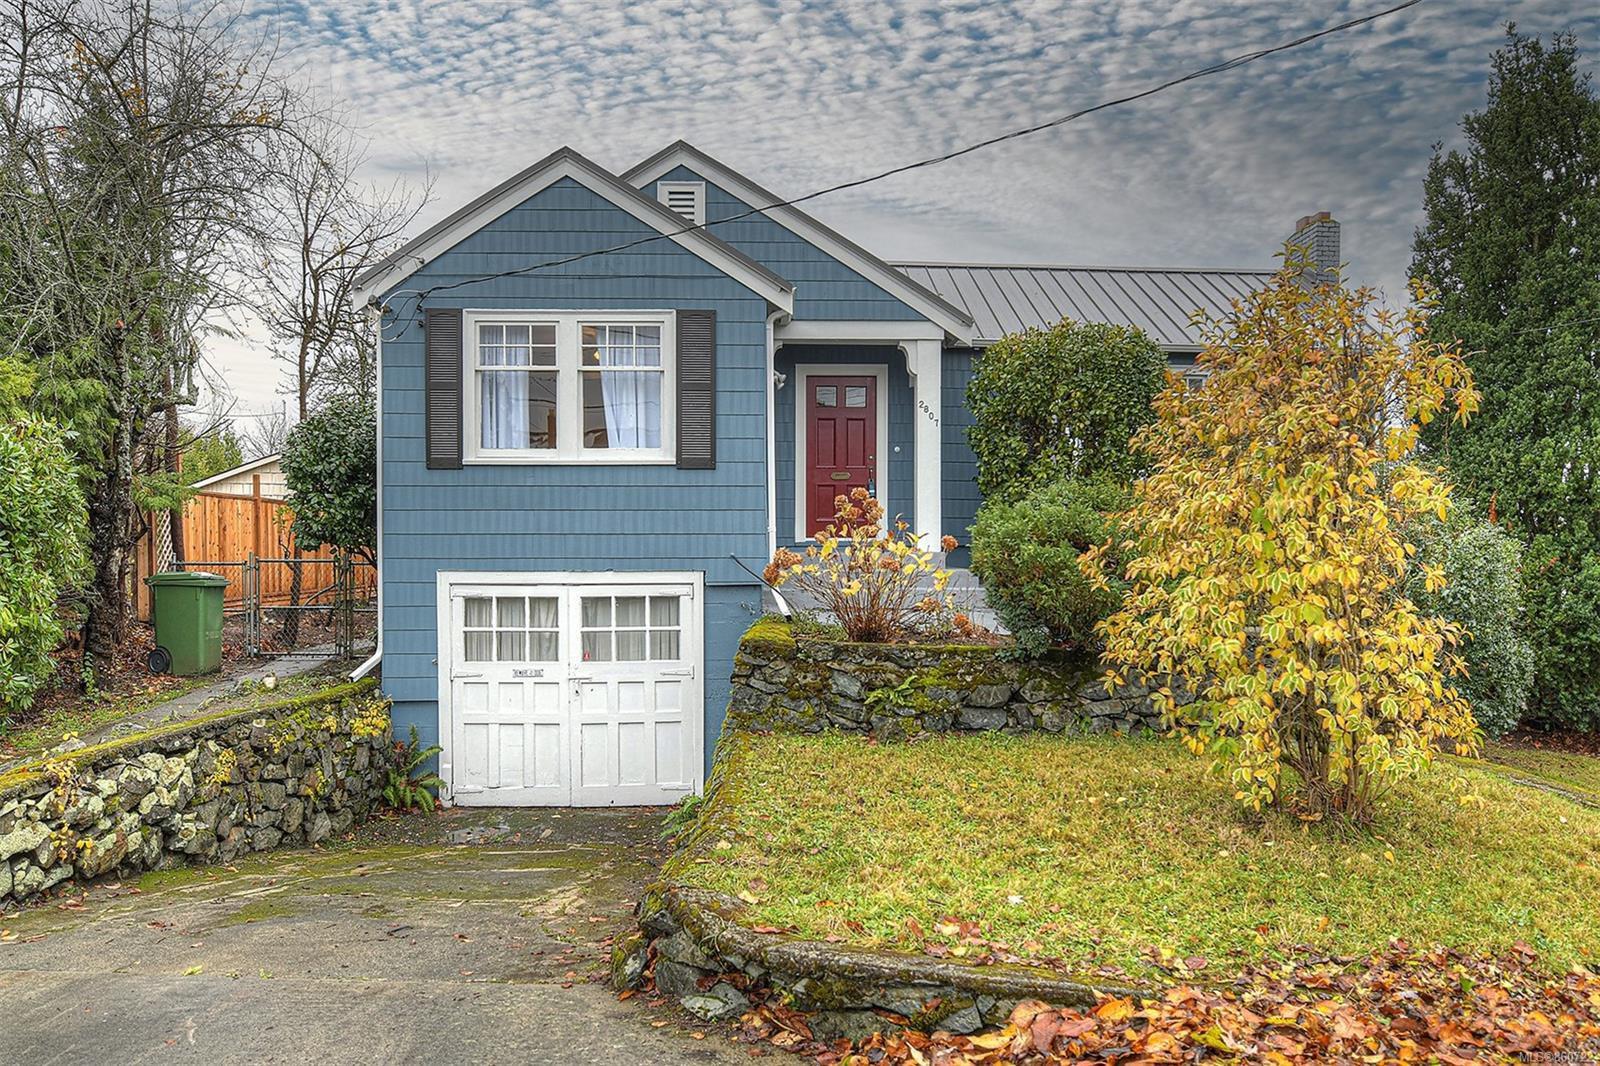 Main Photo: 2807 Irma St in : Vi Burnside House for sale (Victoria)  : MLS®# 860722